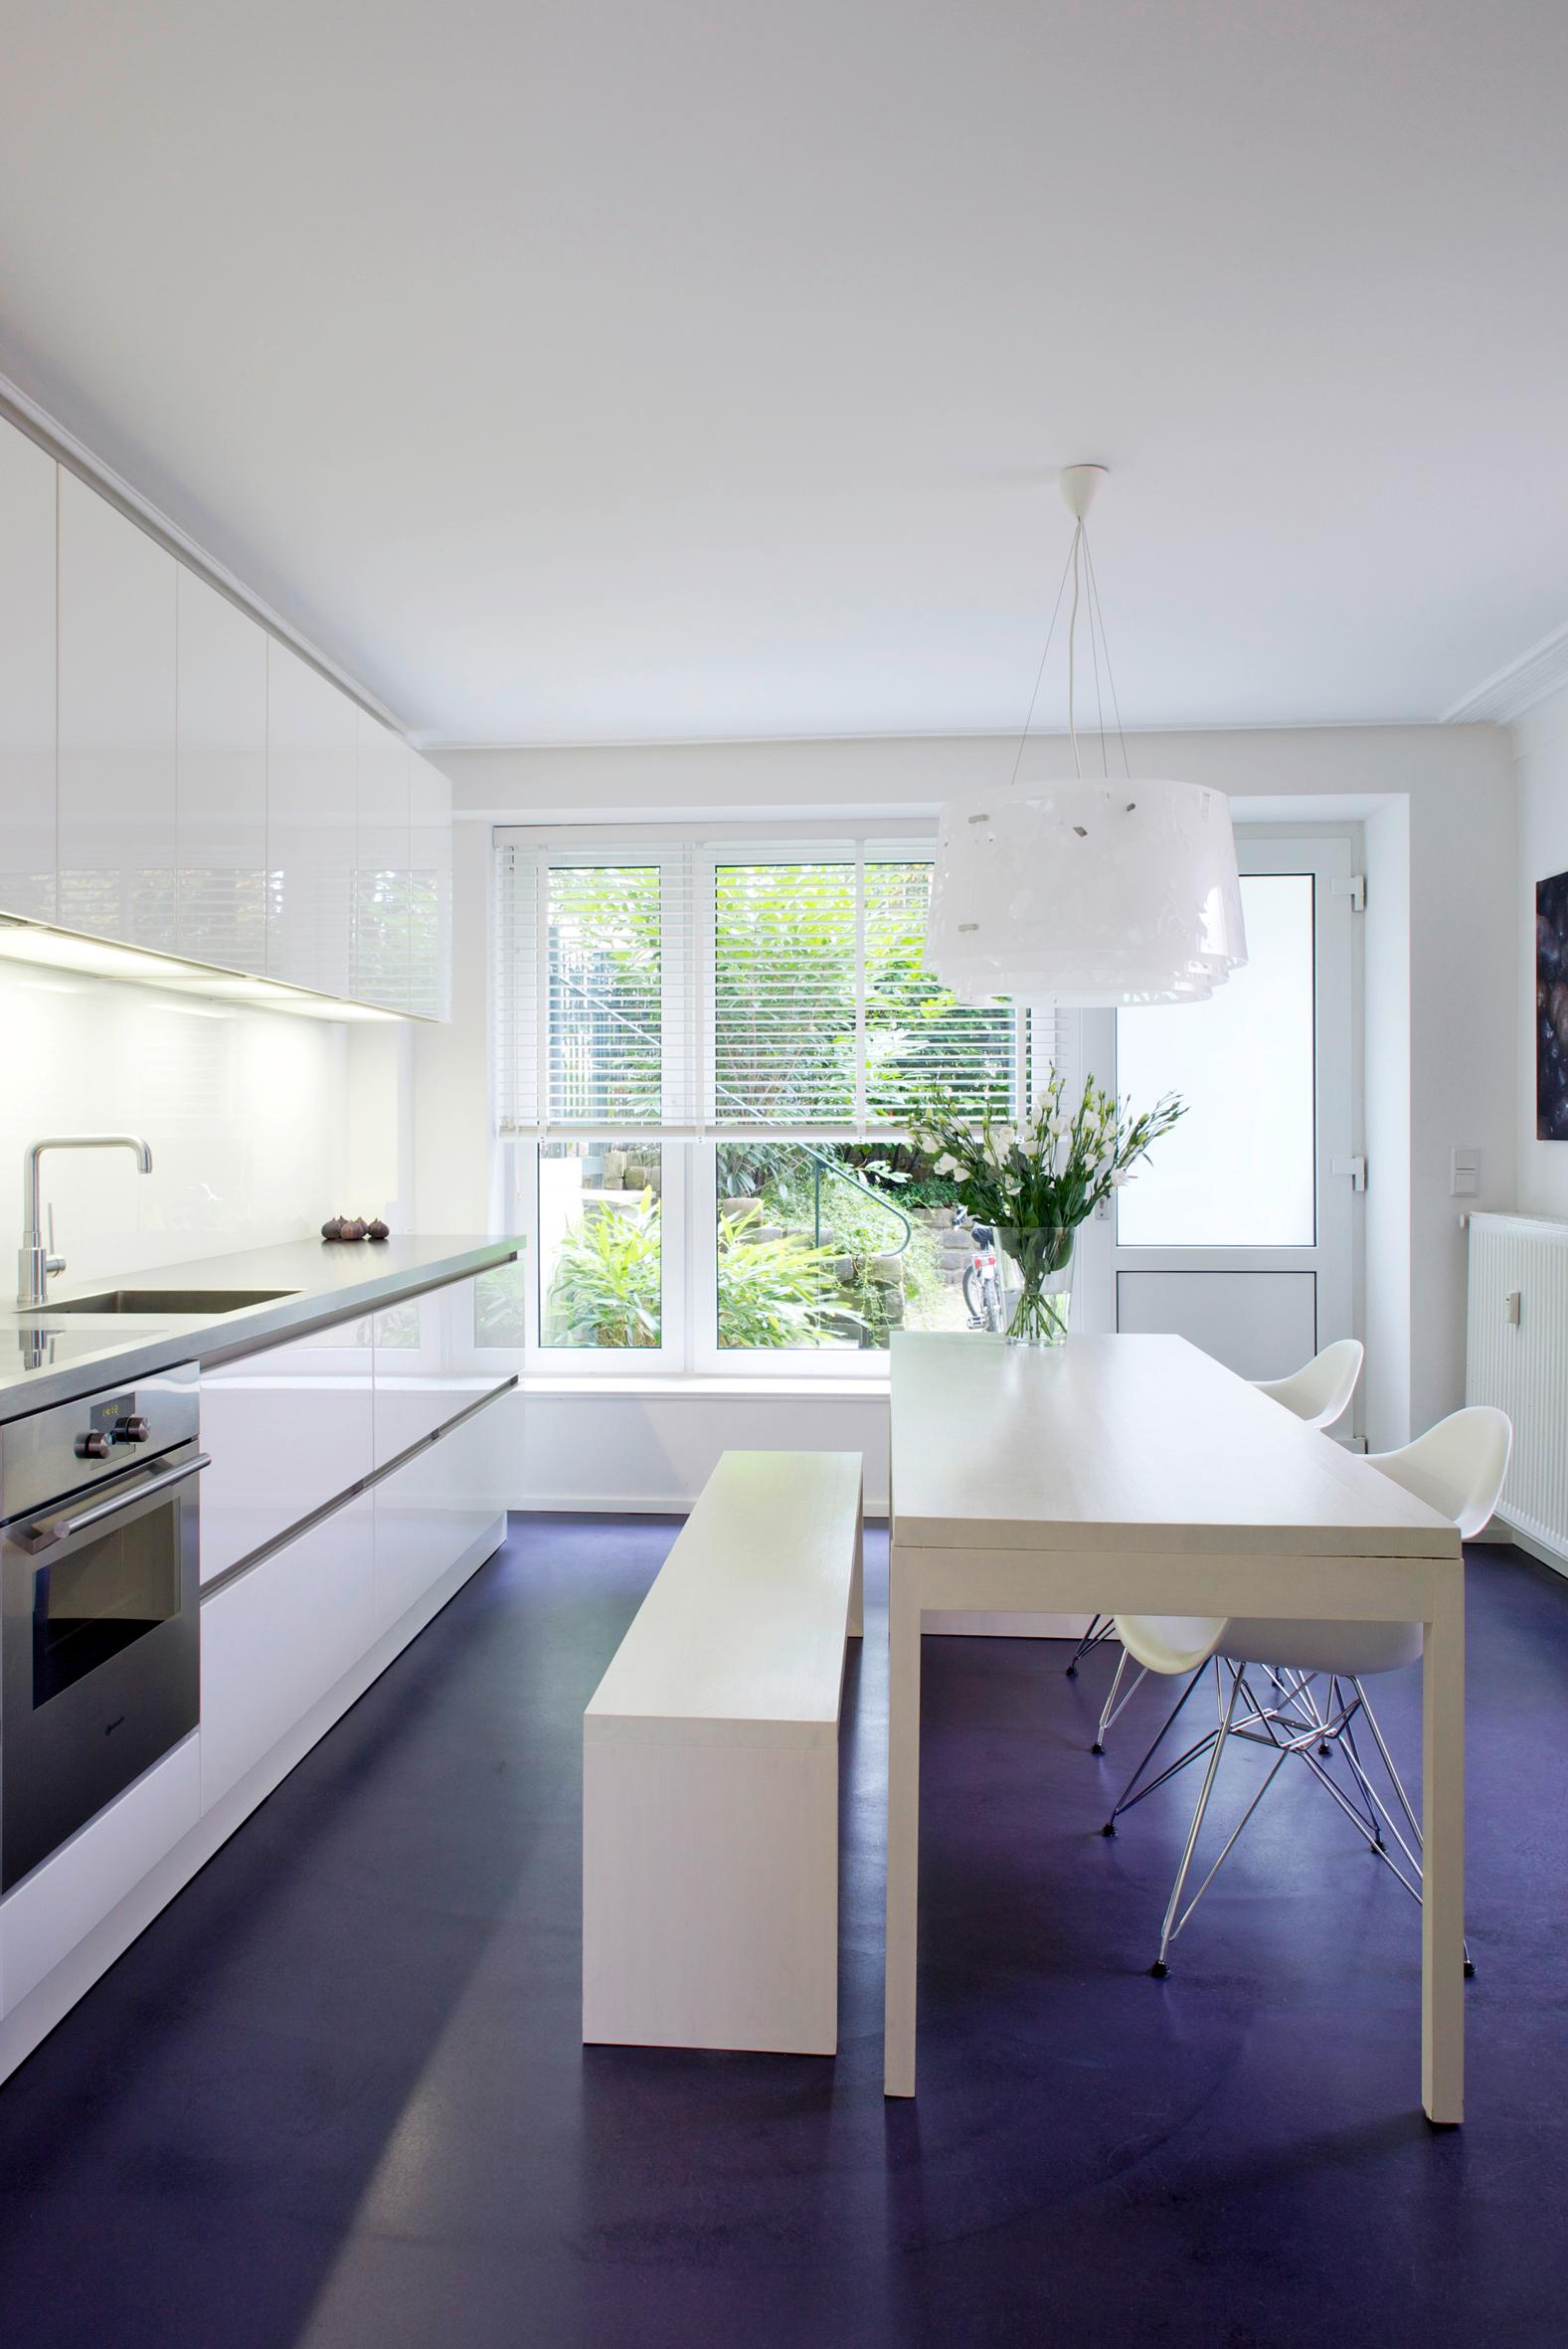 Full Size of Bodenbelag Küche Erneuern Bodenbelag Küche Grau Pvc Boden Küche Obi Bodenbelag Küche Vinyl Bauhaus Küche Bodenbelag Küche